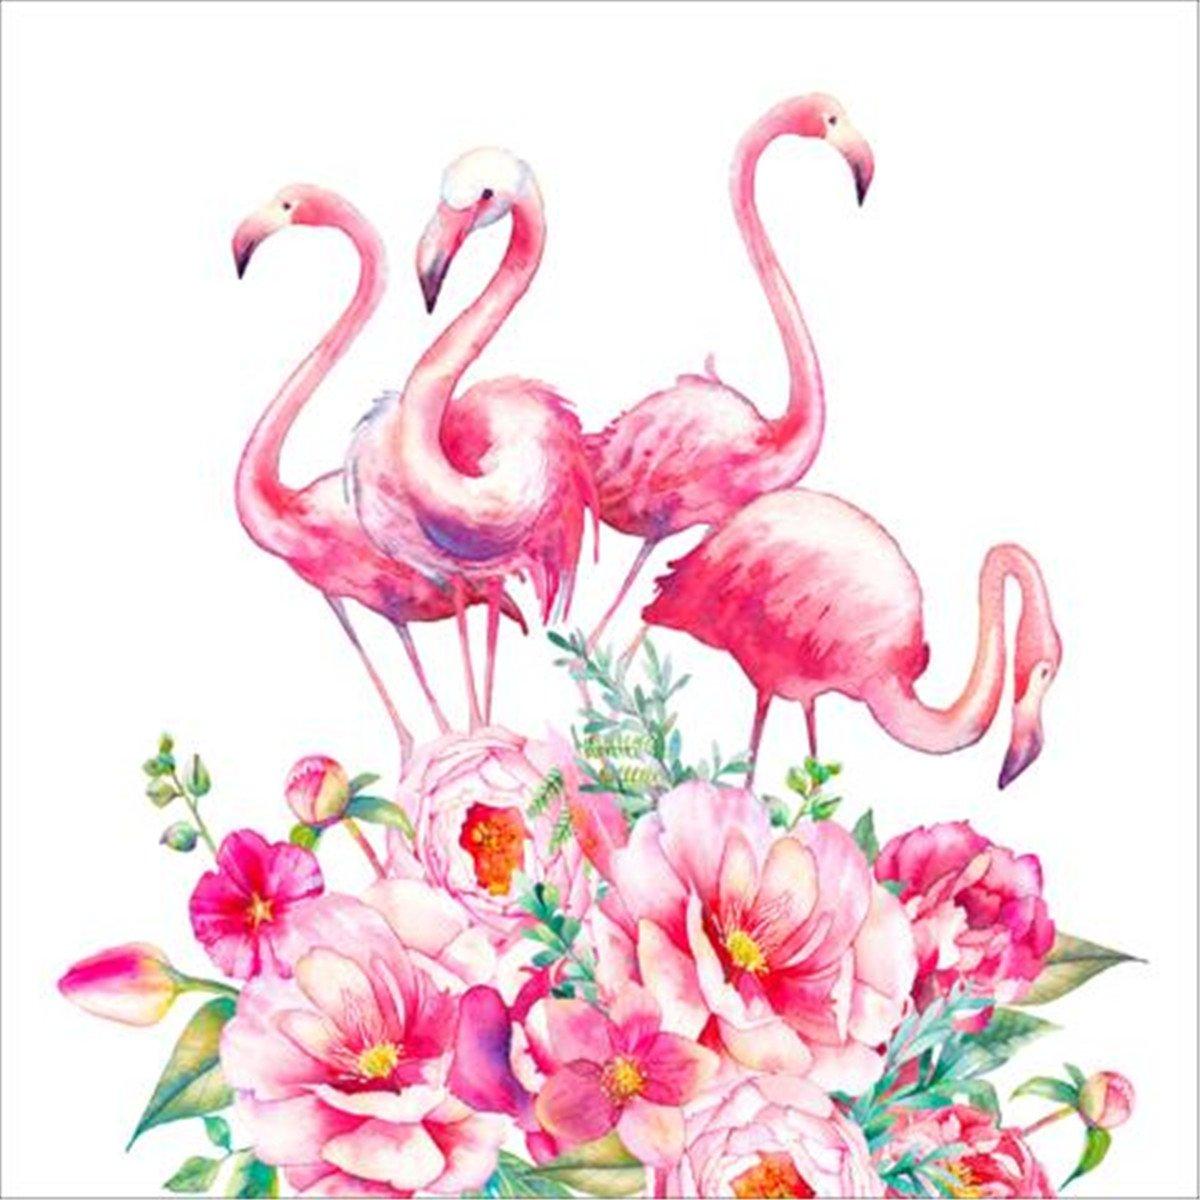 5D Diamond Painting Kit DIY Rhinestone Embroidery Cross Stitch Arts Craft for Home Wall Decor Flamingos 12x12 inch EOBROMD